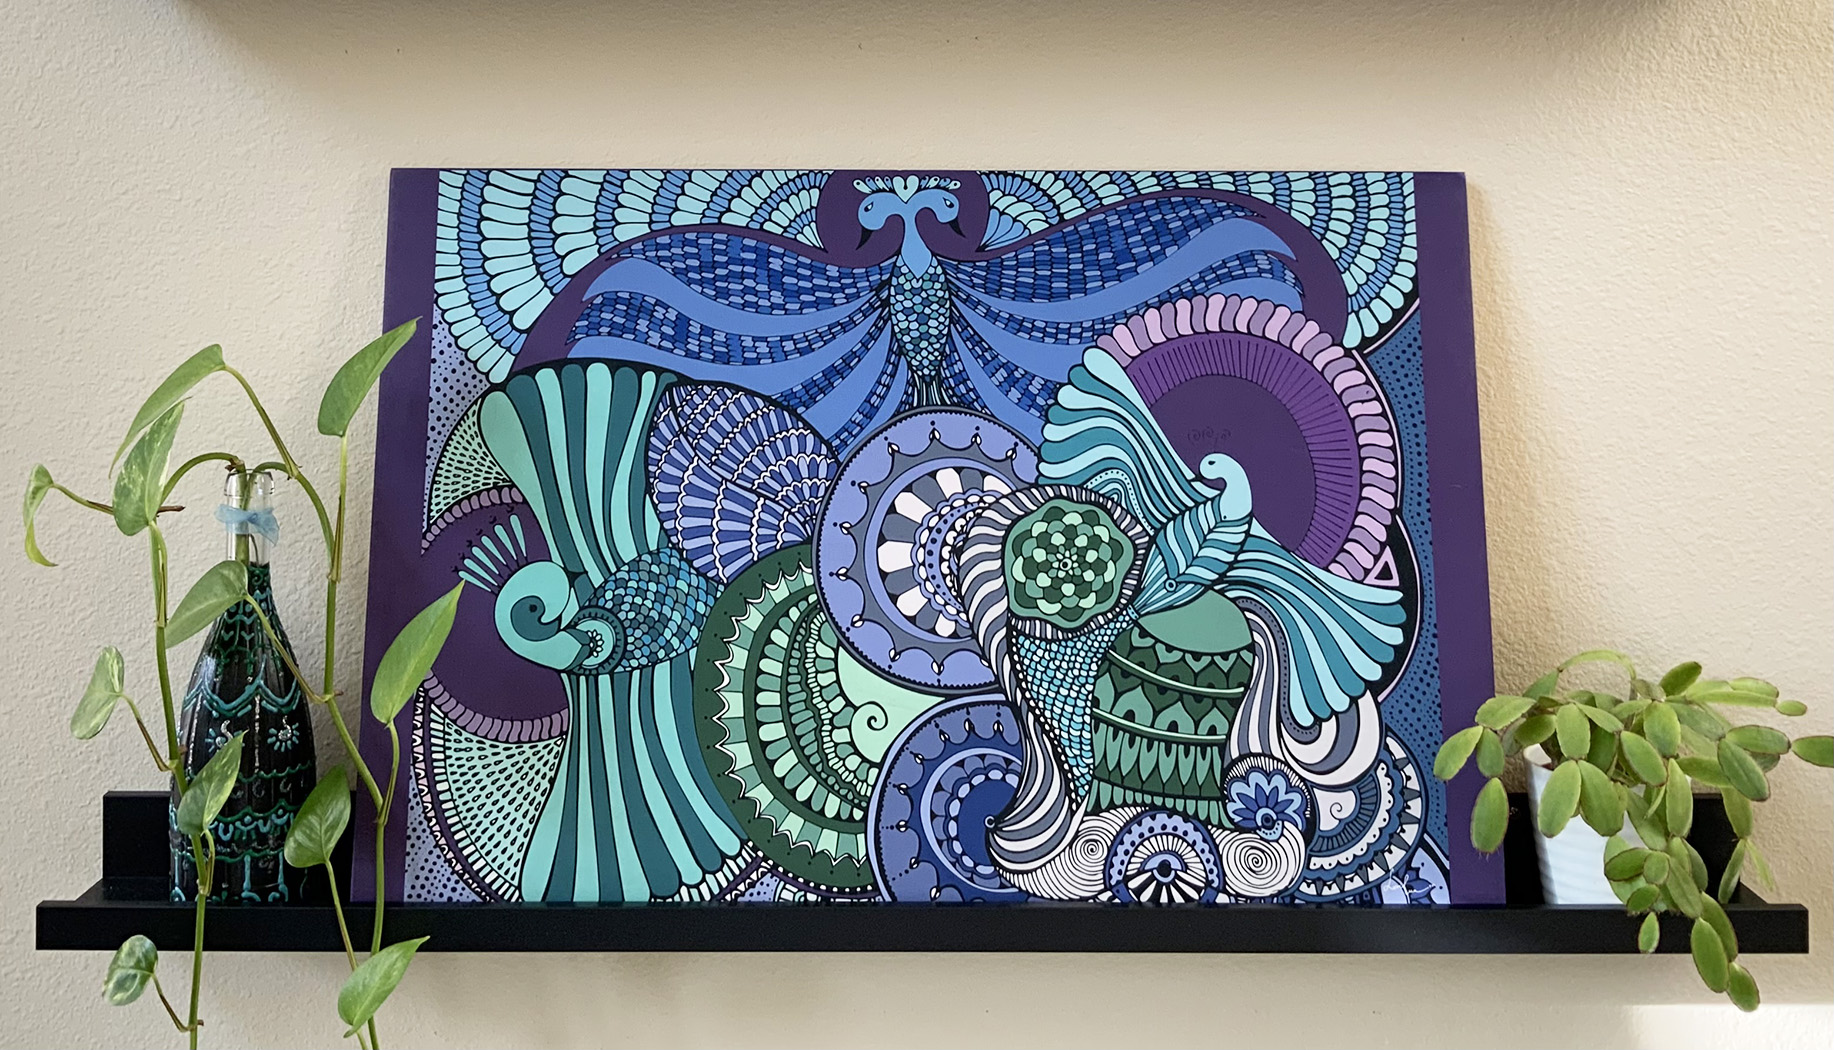 LS-soar-high-seagreen-wood-panel-4